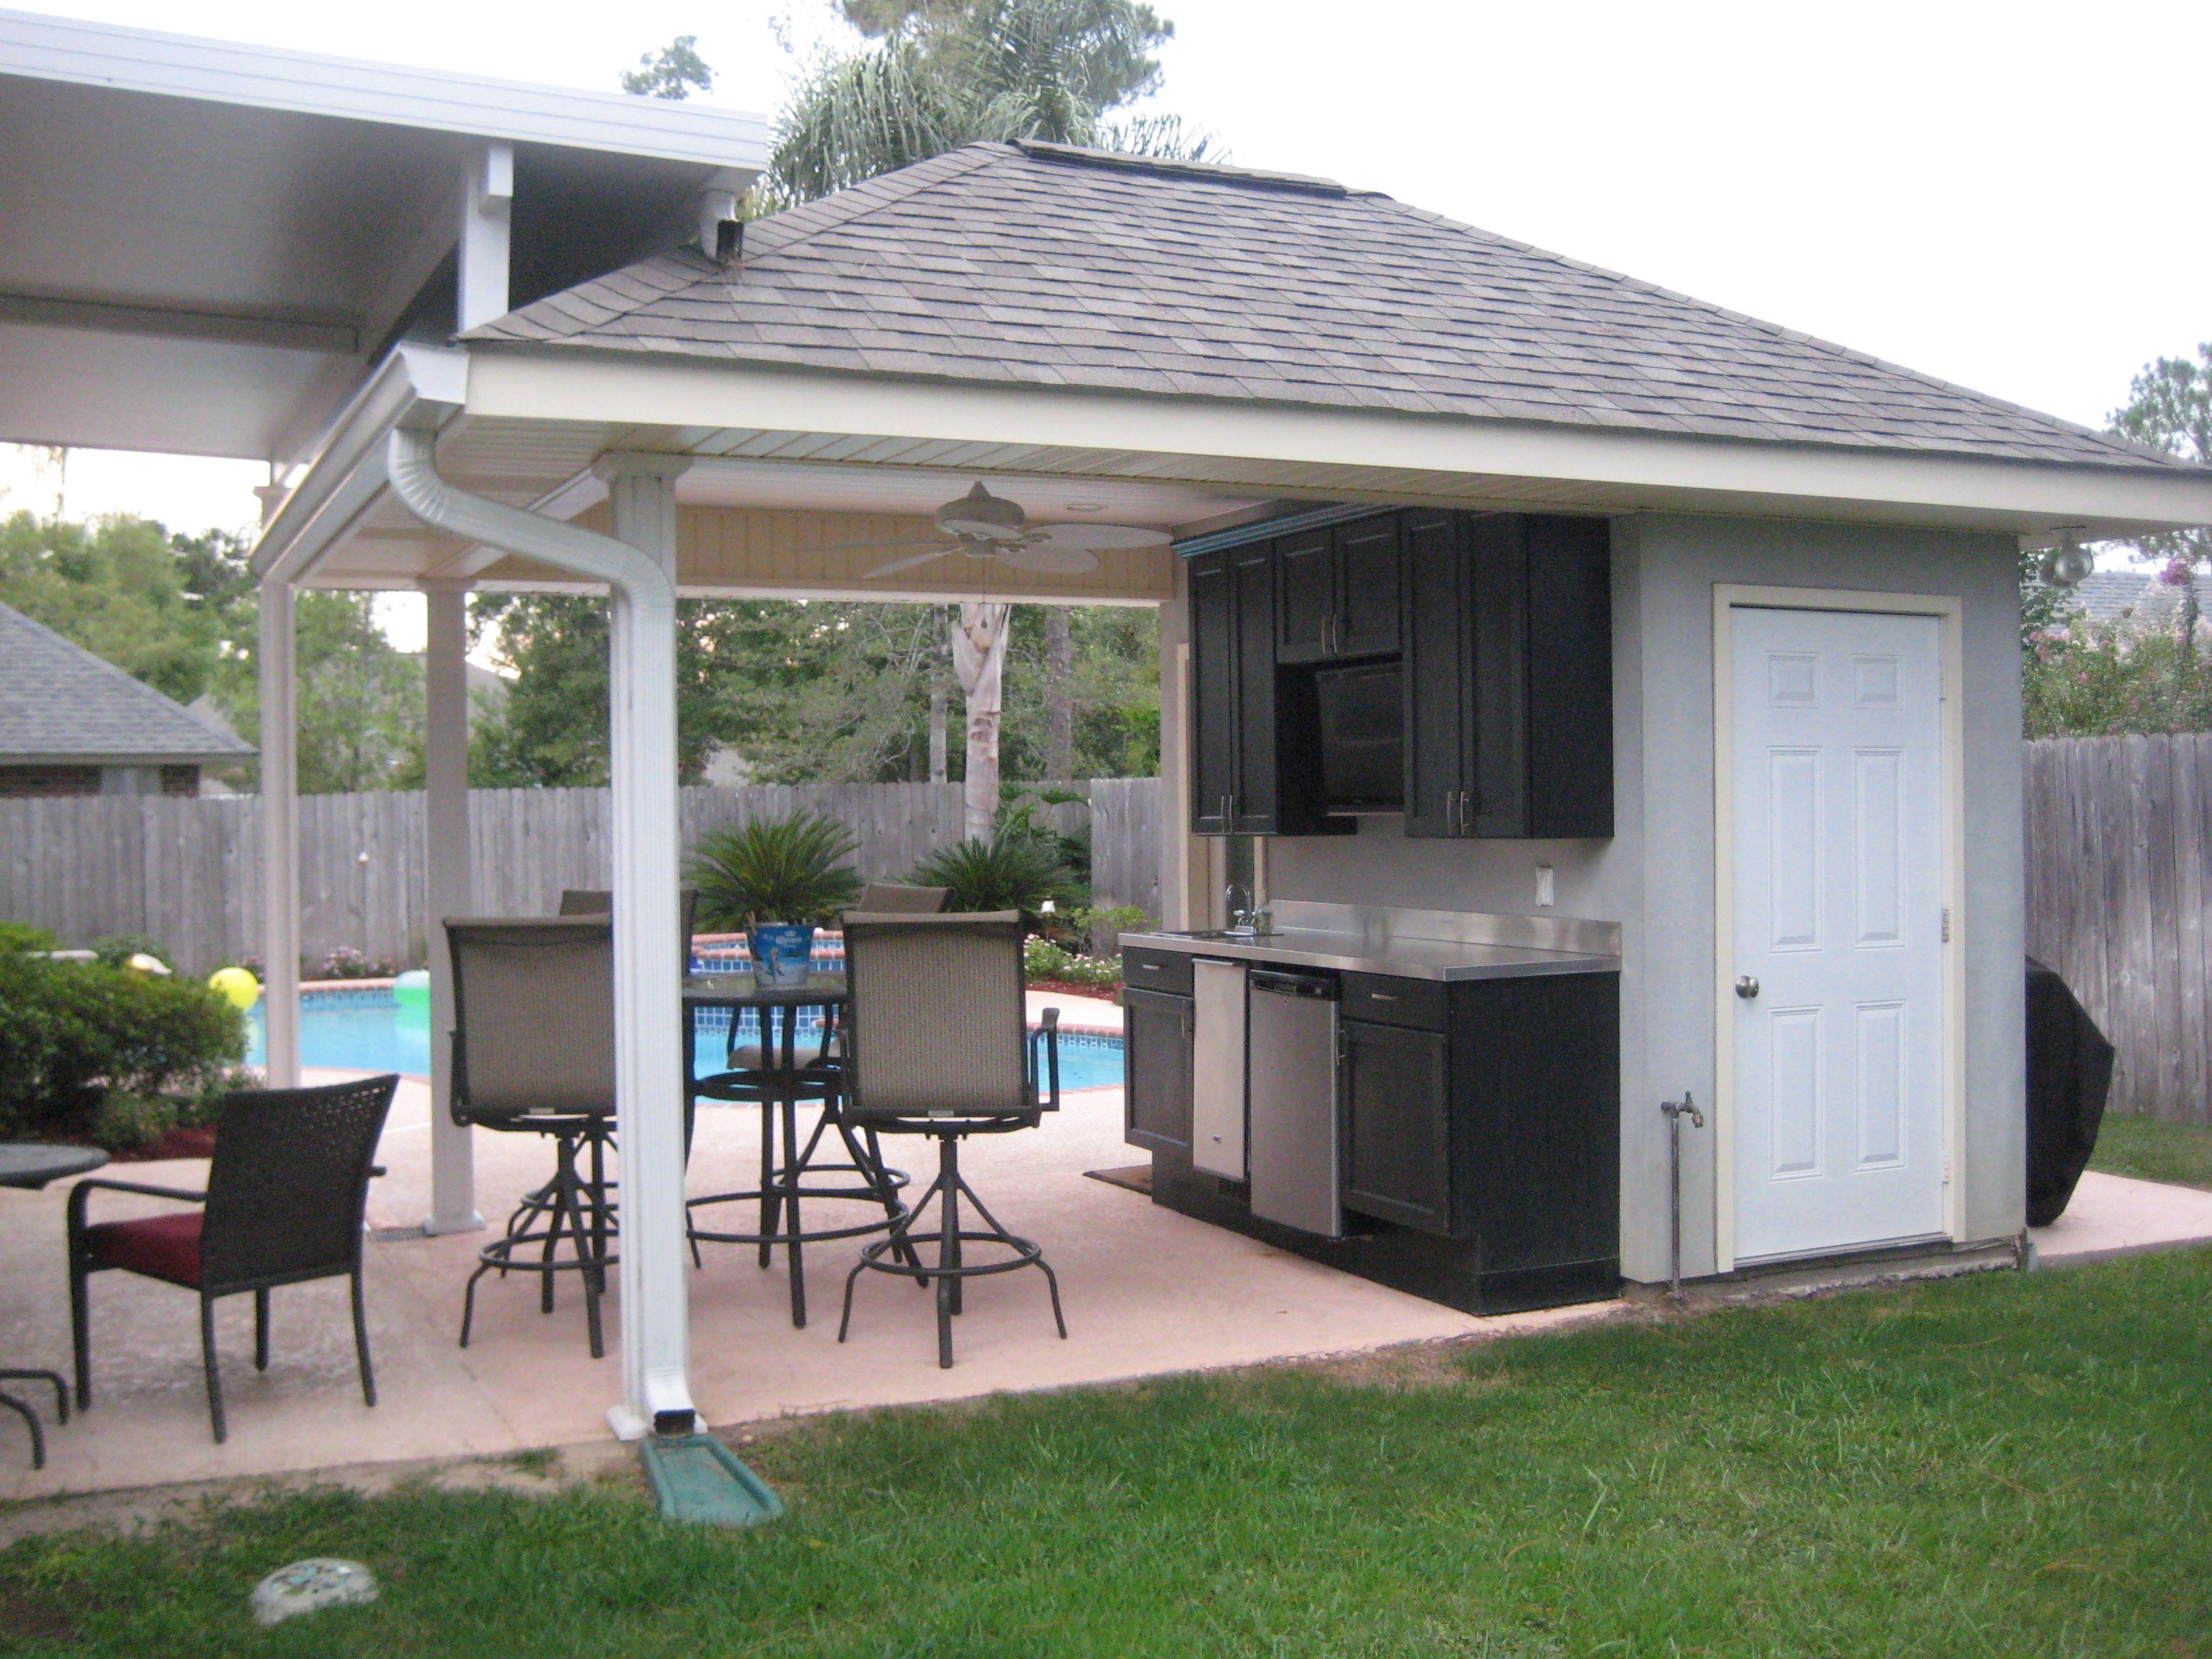 image result for pool cabana conservatory garden tea room